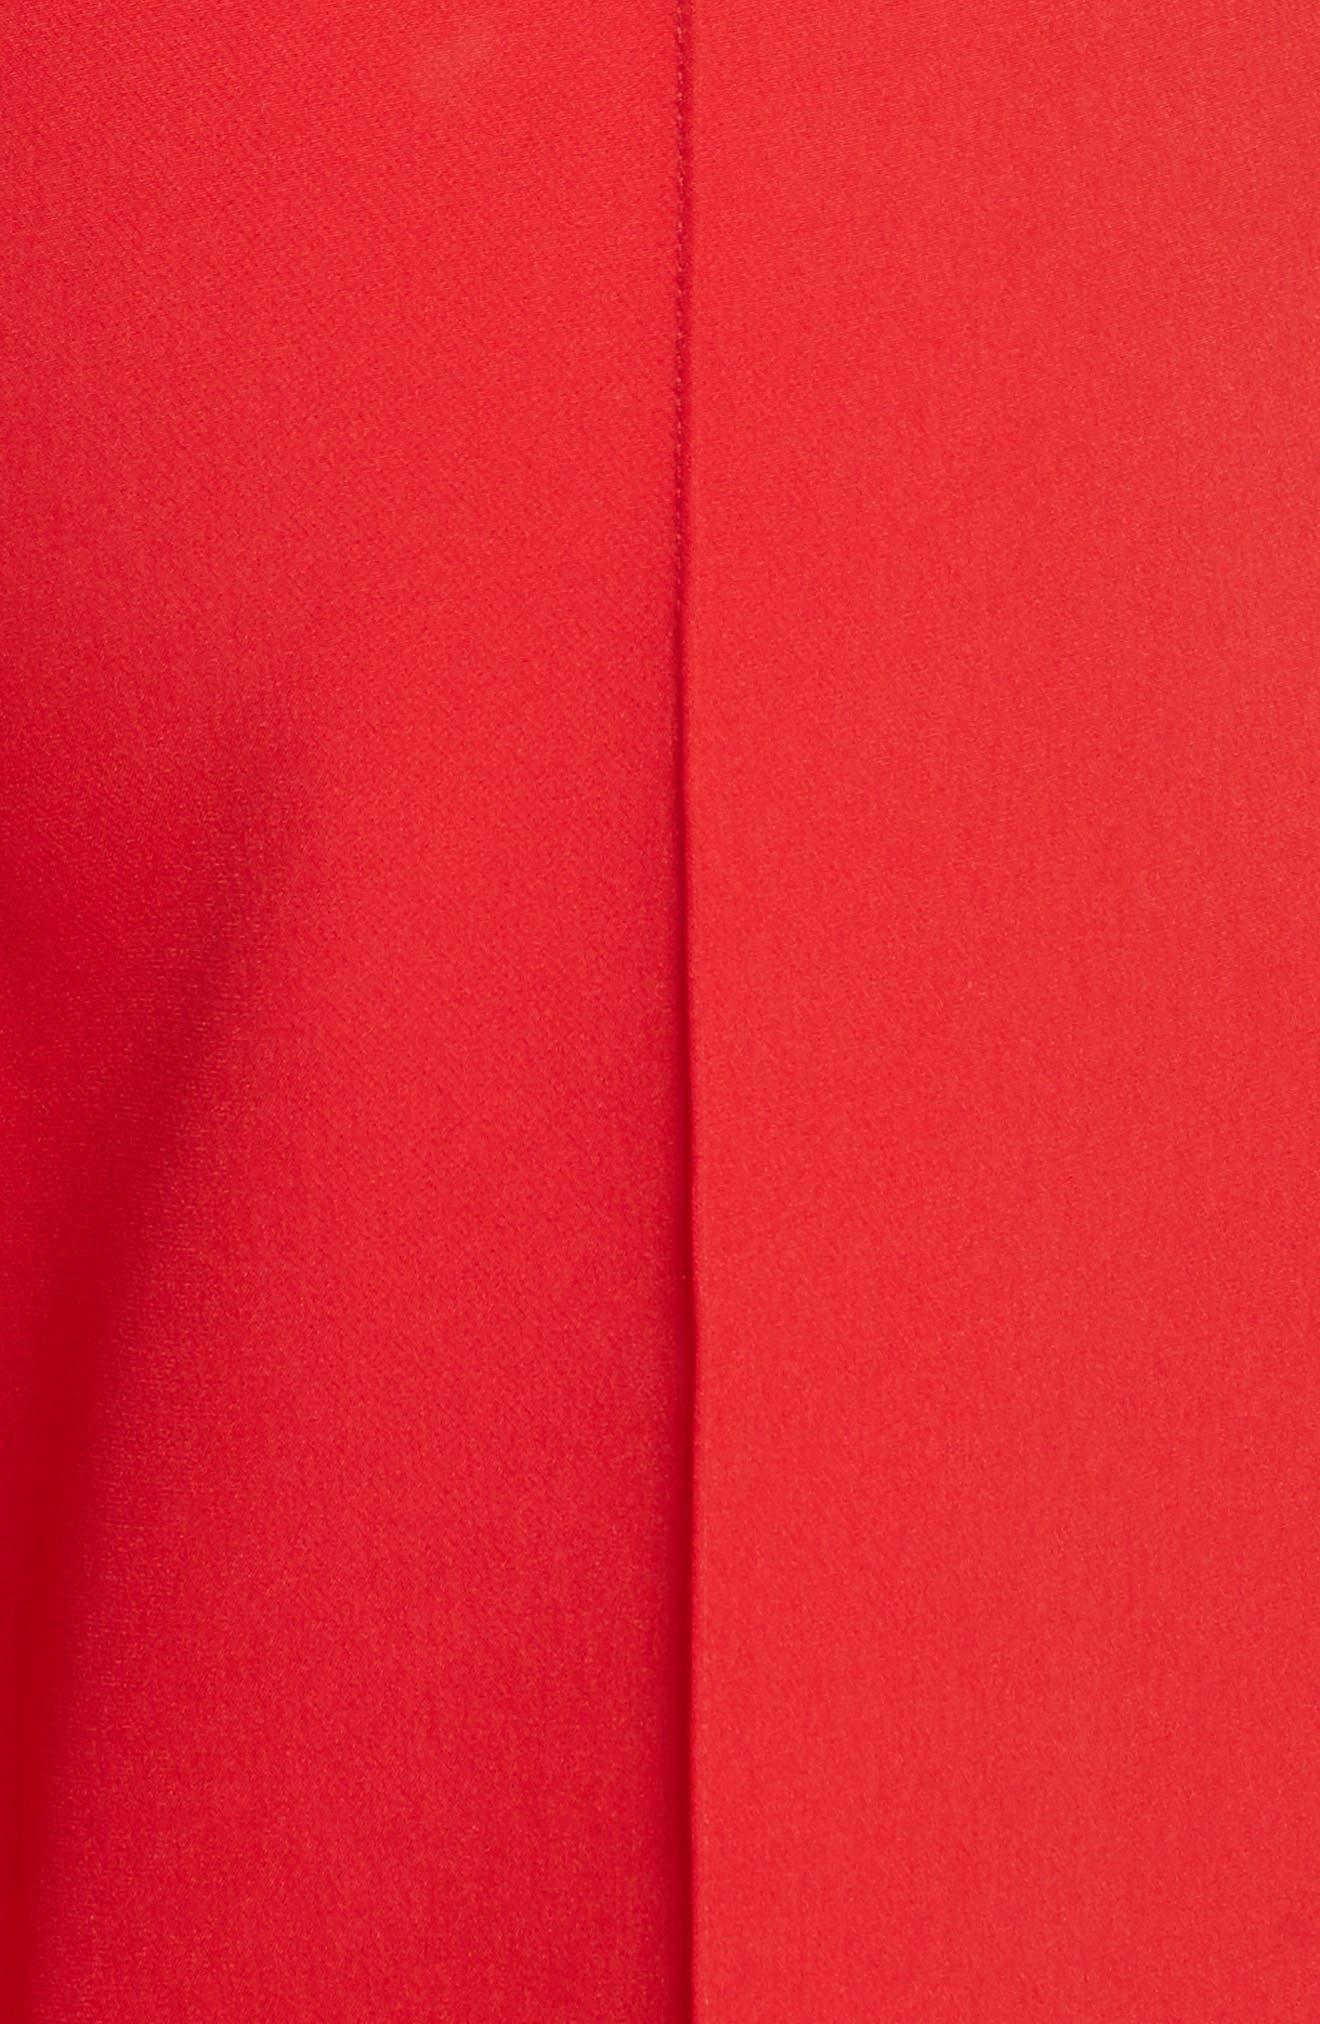 Hayden Italian Cady Crop Pants,                             Alternate thumbnail 5, color,                             649